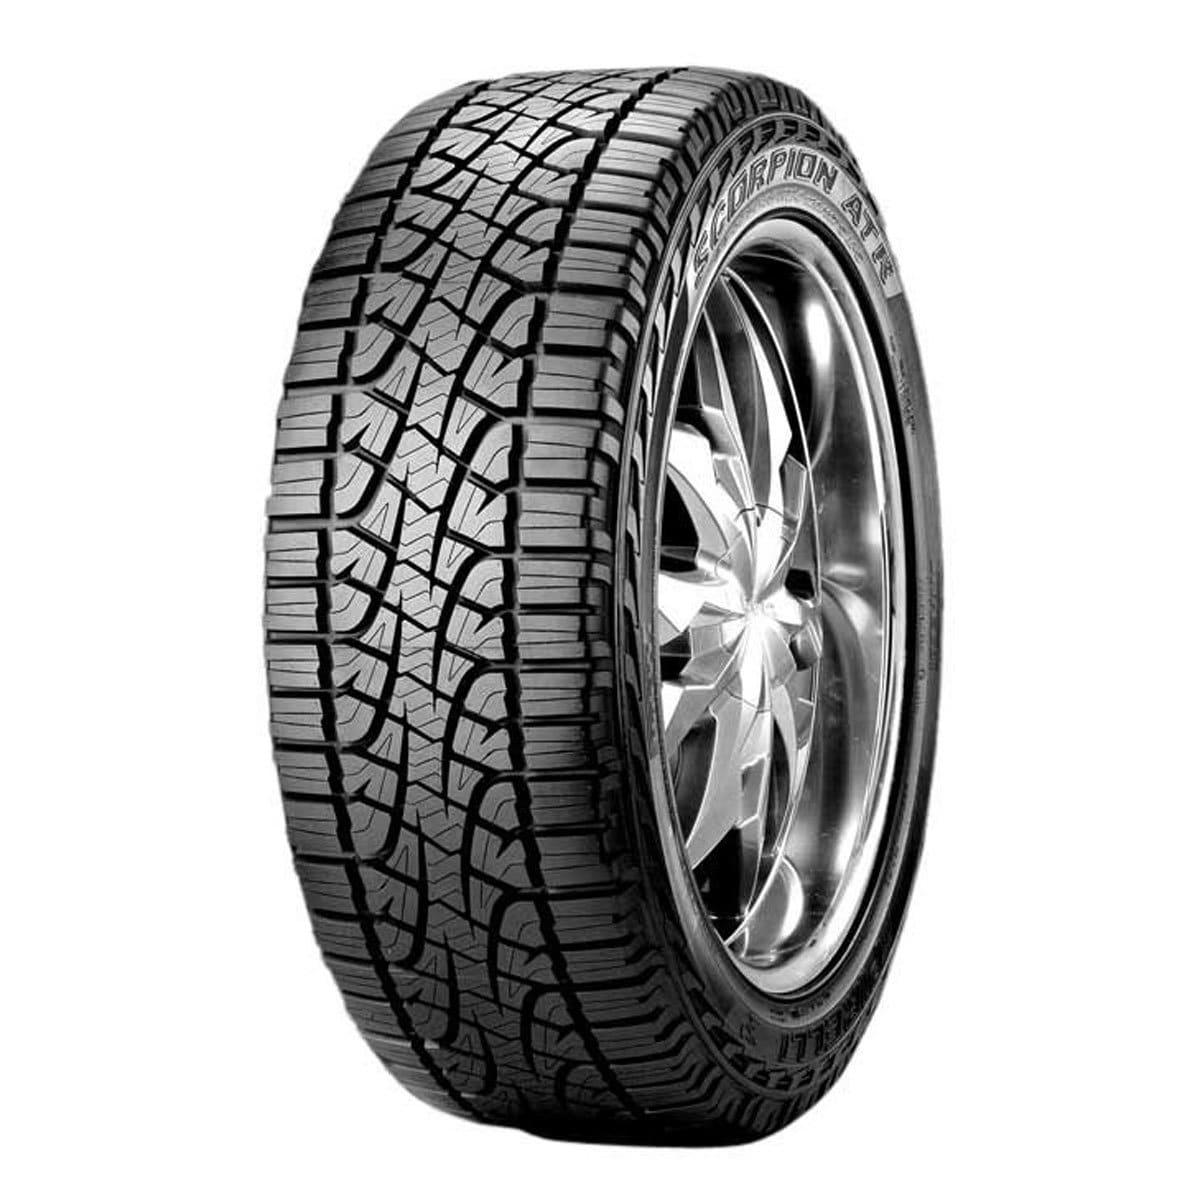 Spllanta 255 70 R16 Sc Atr Pirelli